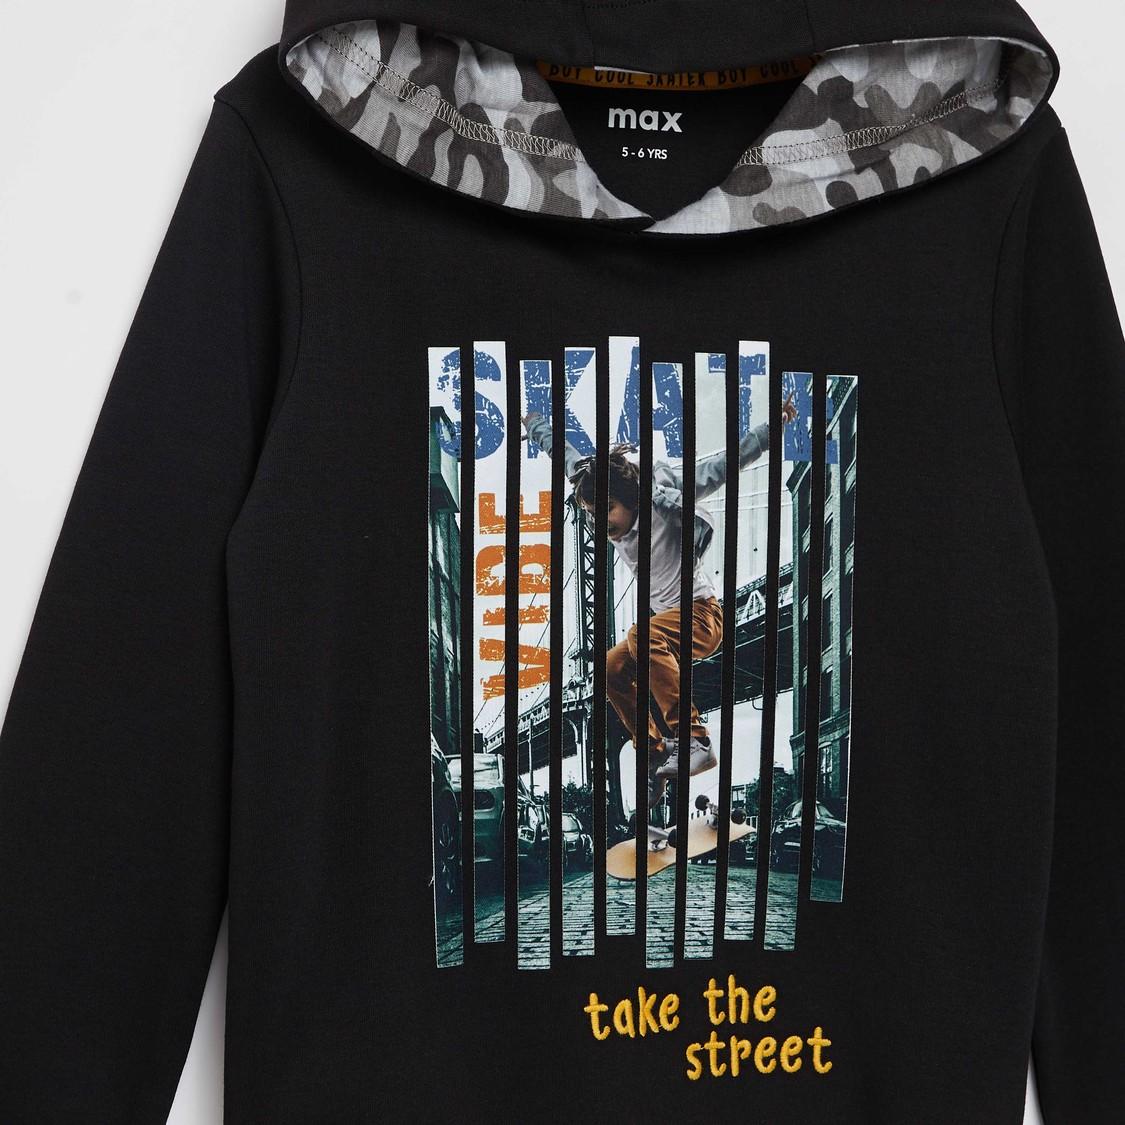 Digital Print Sweatshirt with Hooded Neck and Long Sleeves